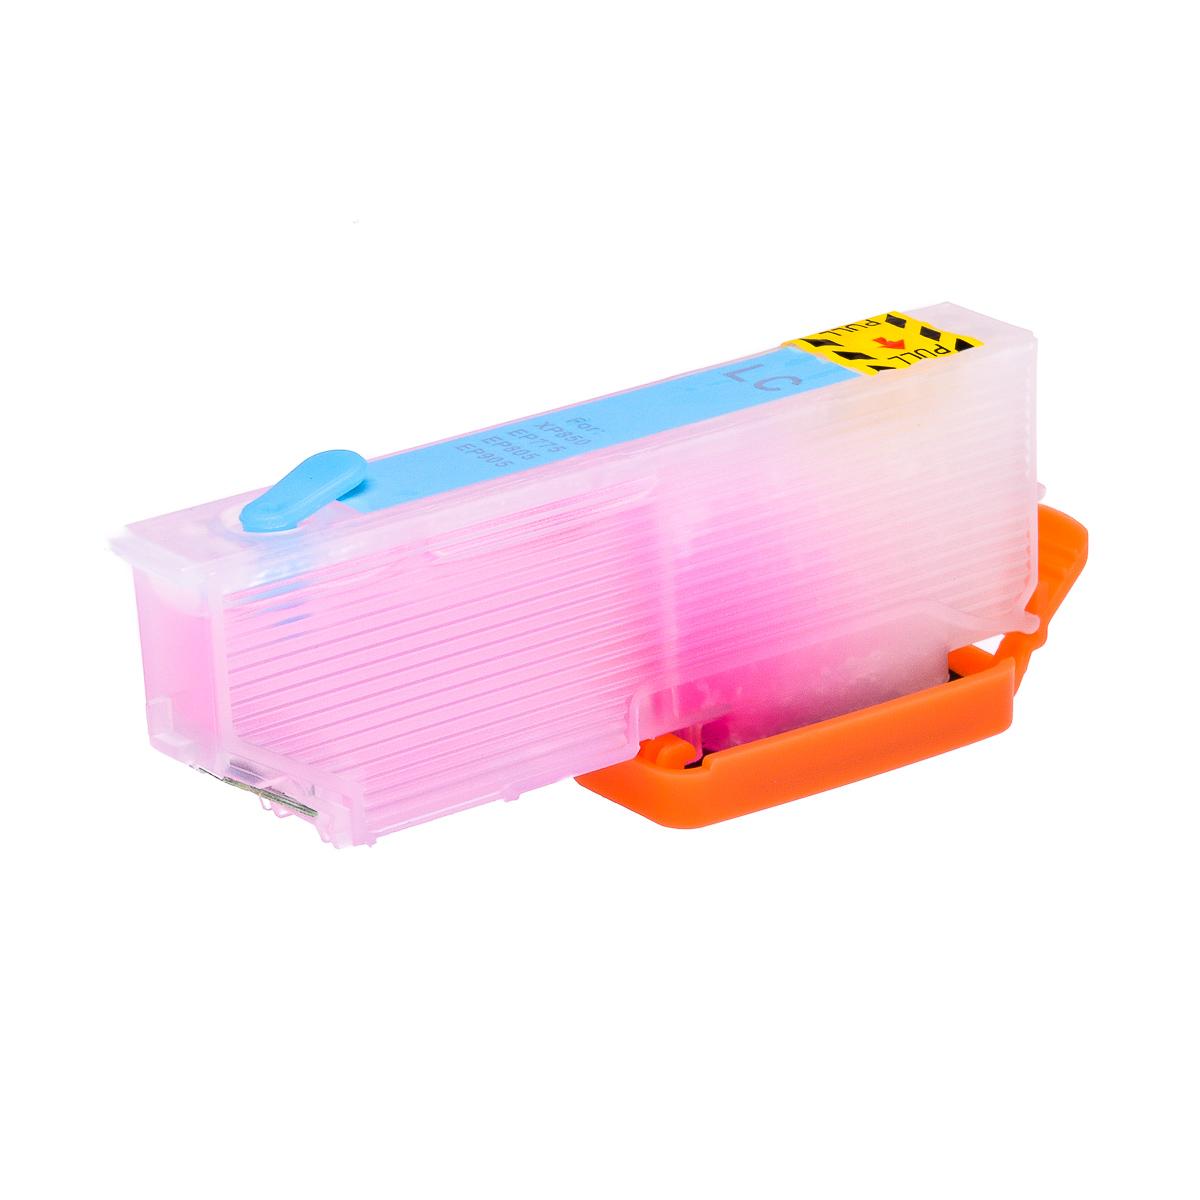 Light Cyan printhead cleaning cartridge for Epson XP-55 printer